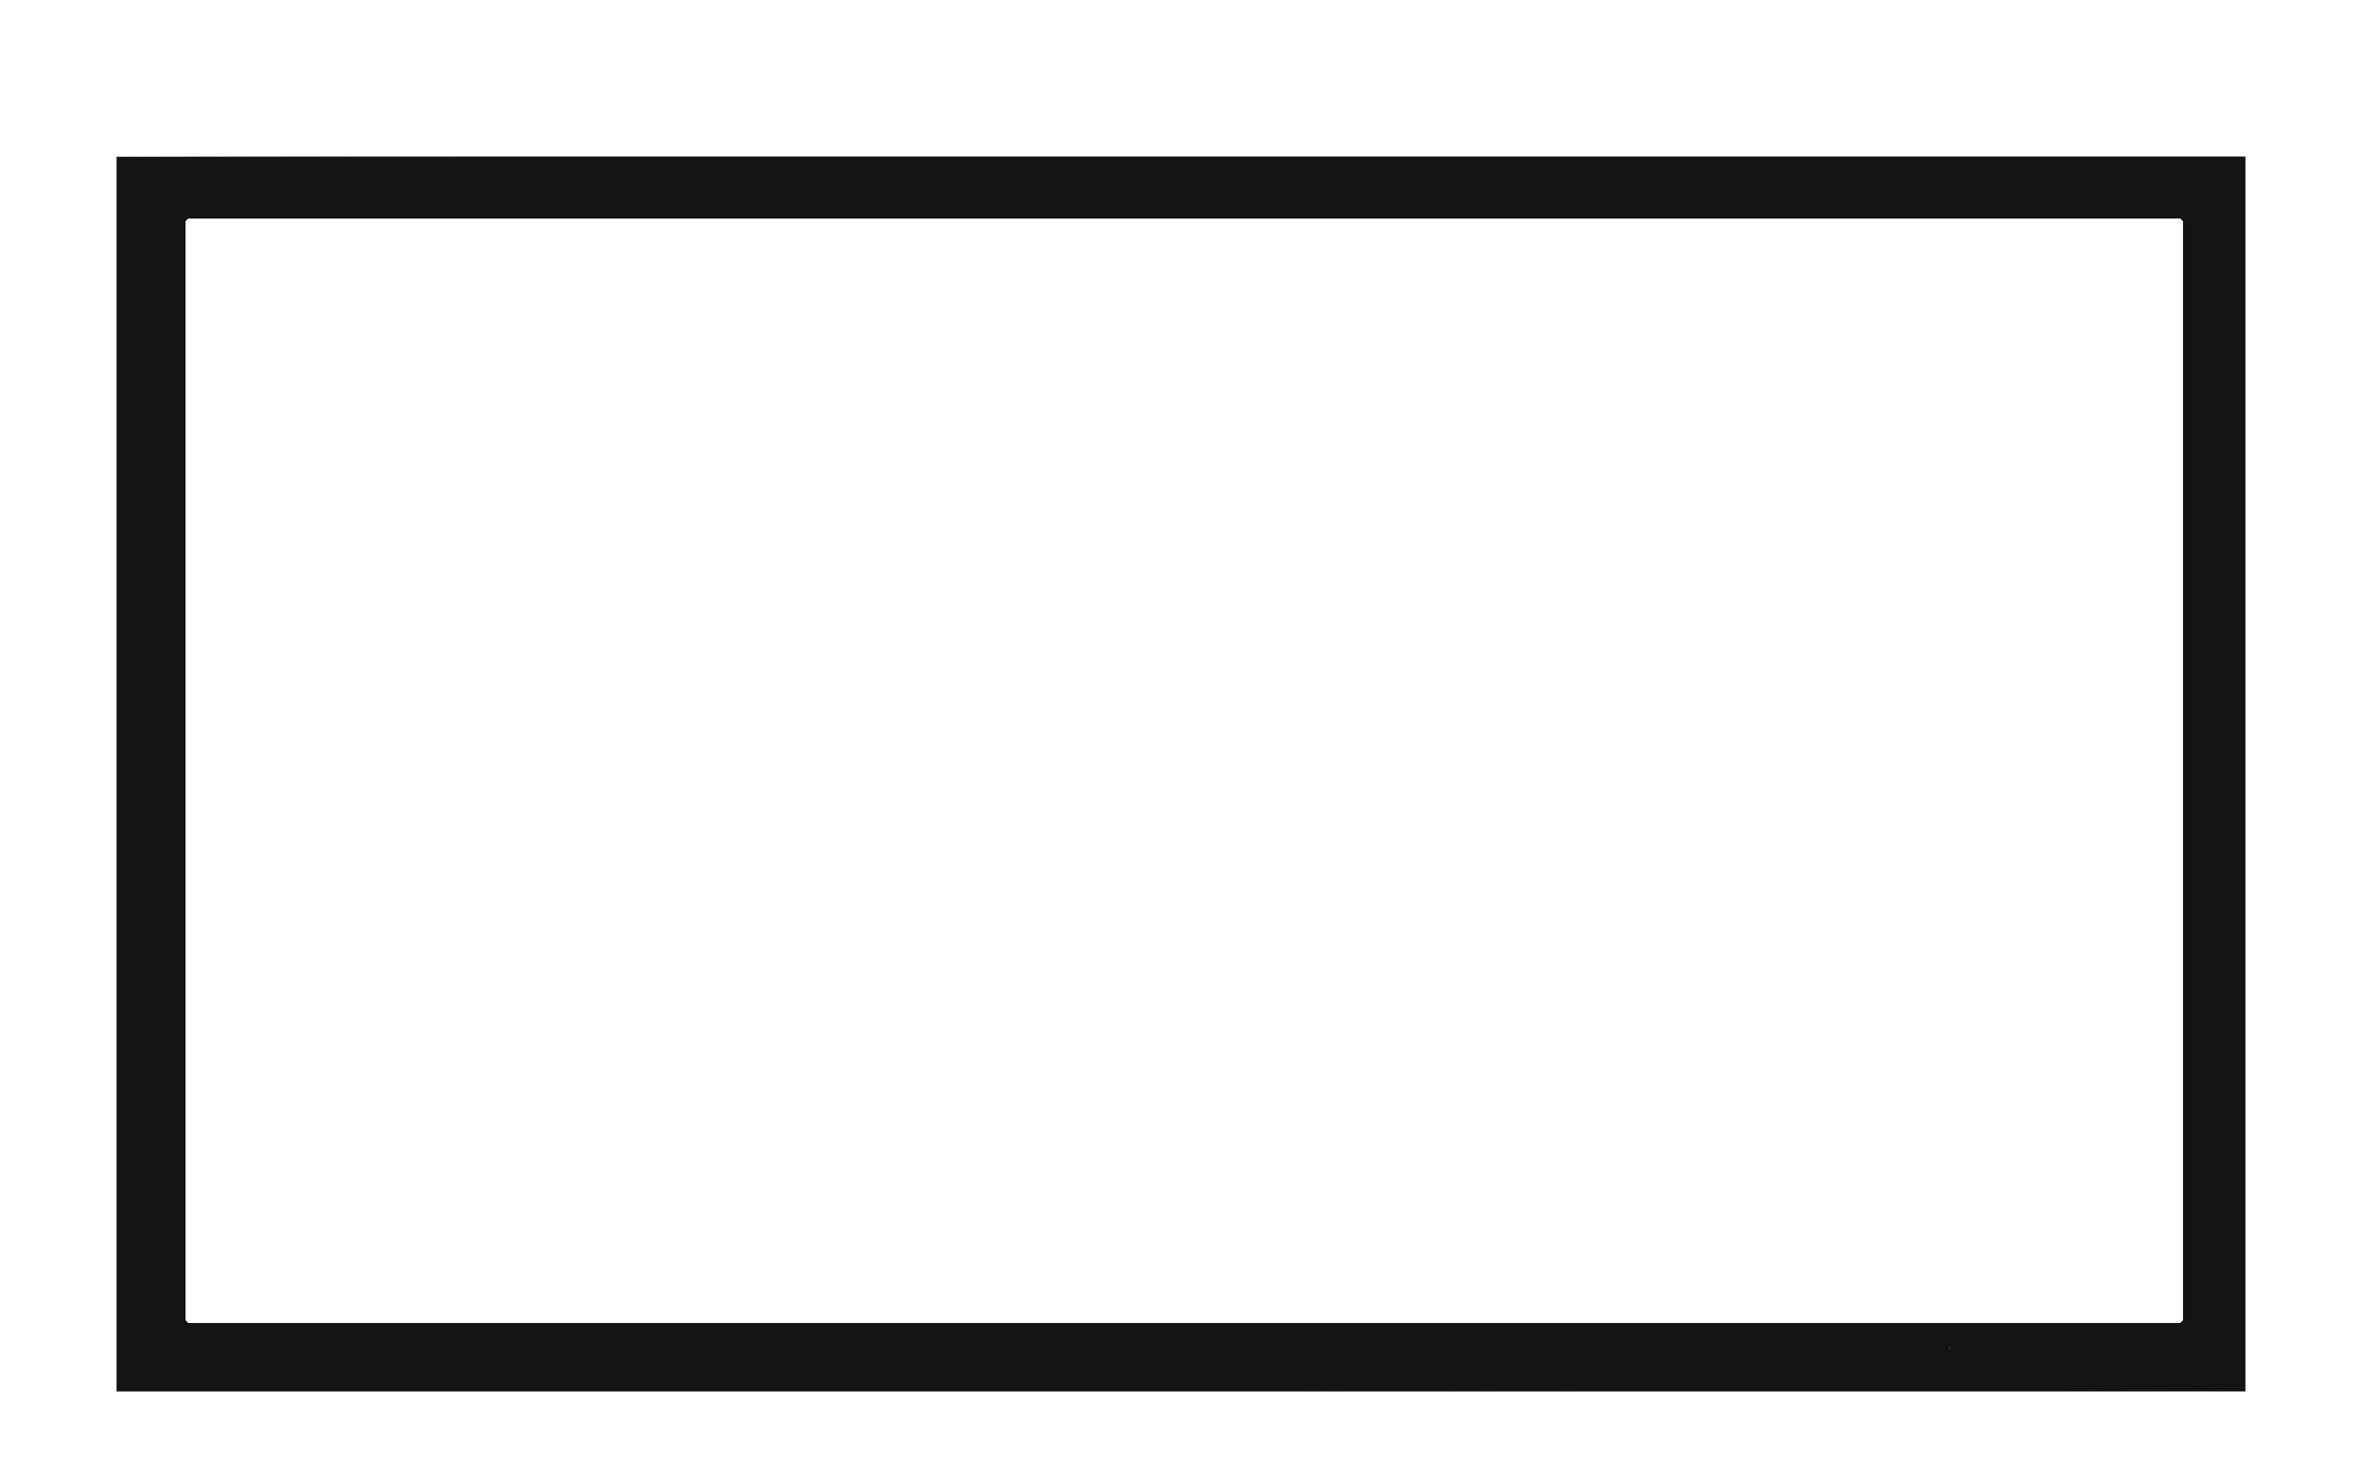 ppt 背景 背景图片 边框 模板 设计 矢量 矢量图 素材 相框 2367_1479